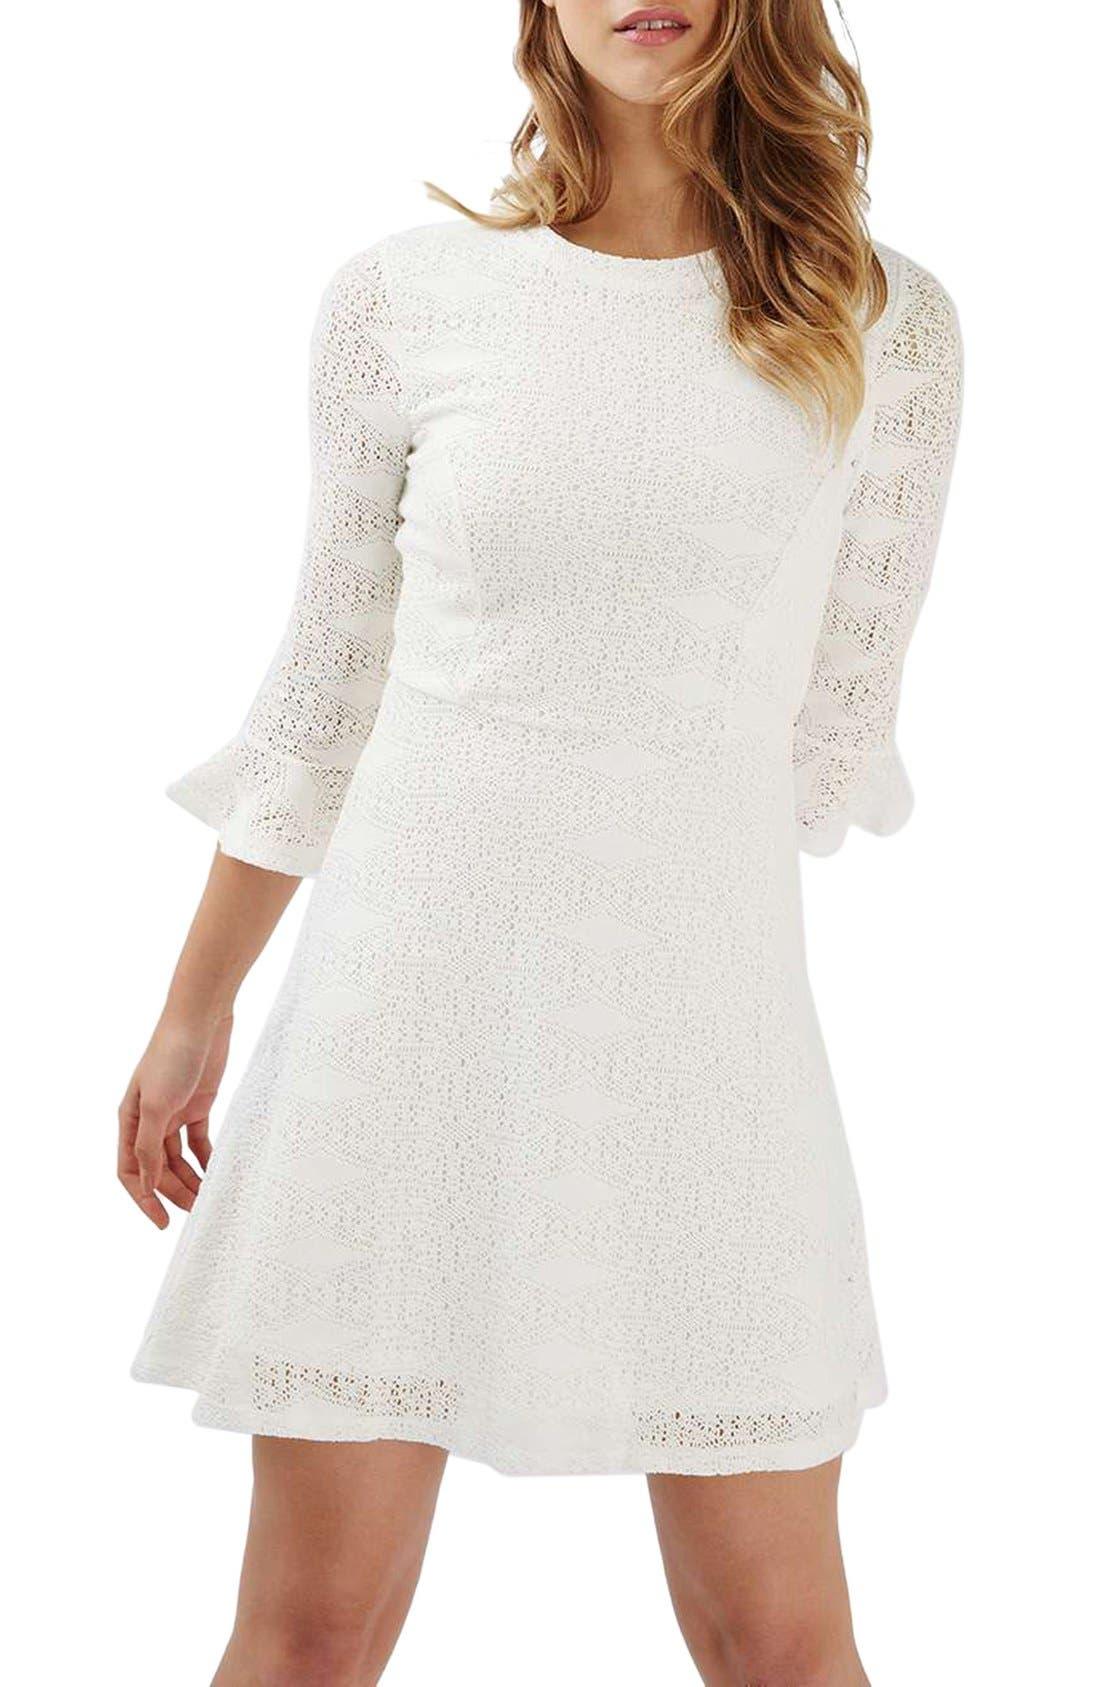 Main Image - Topshop Flute Sleeve Crochet Dress